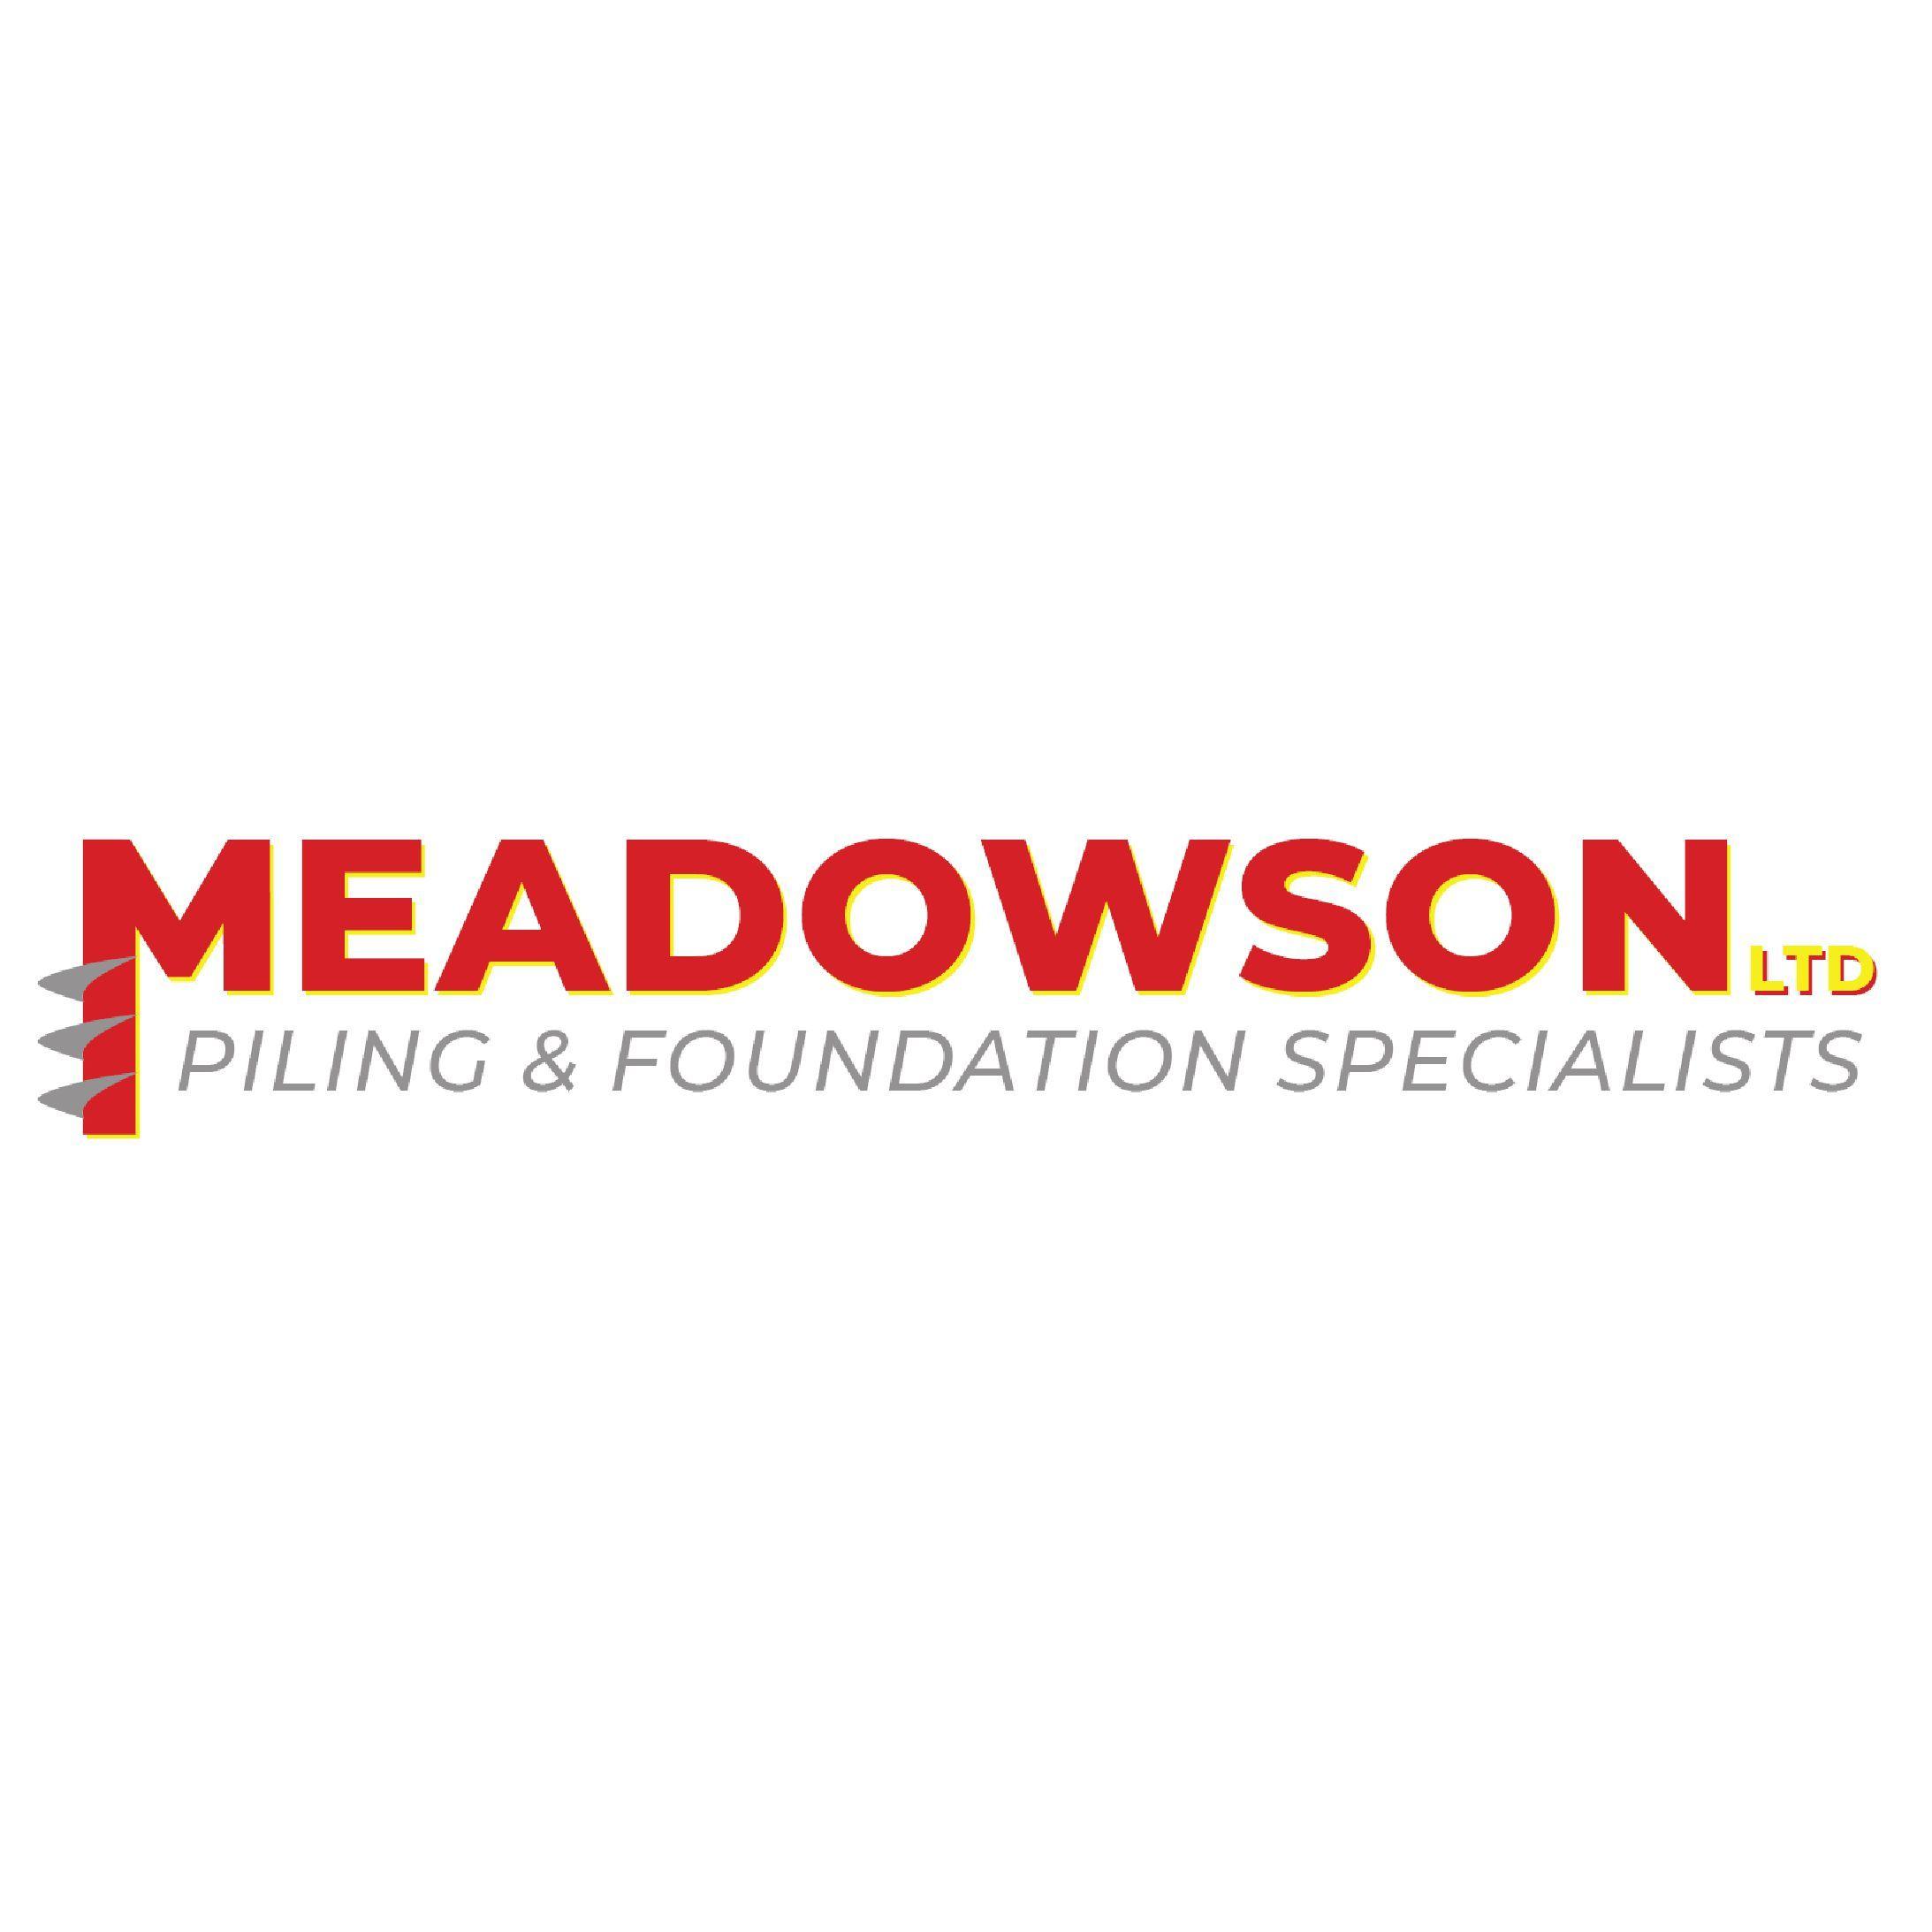 Dick Cavill- Meadowson Ltd